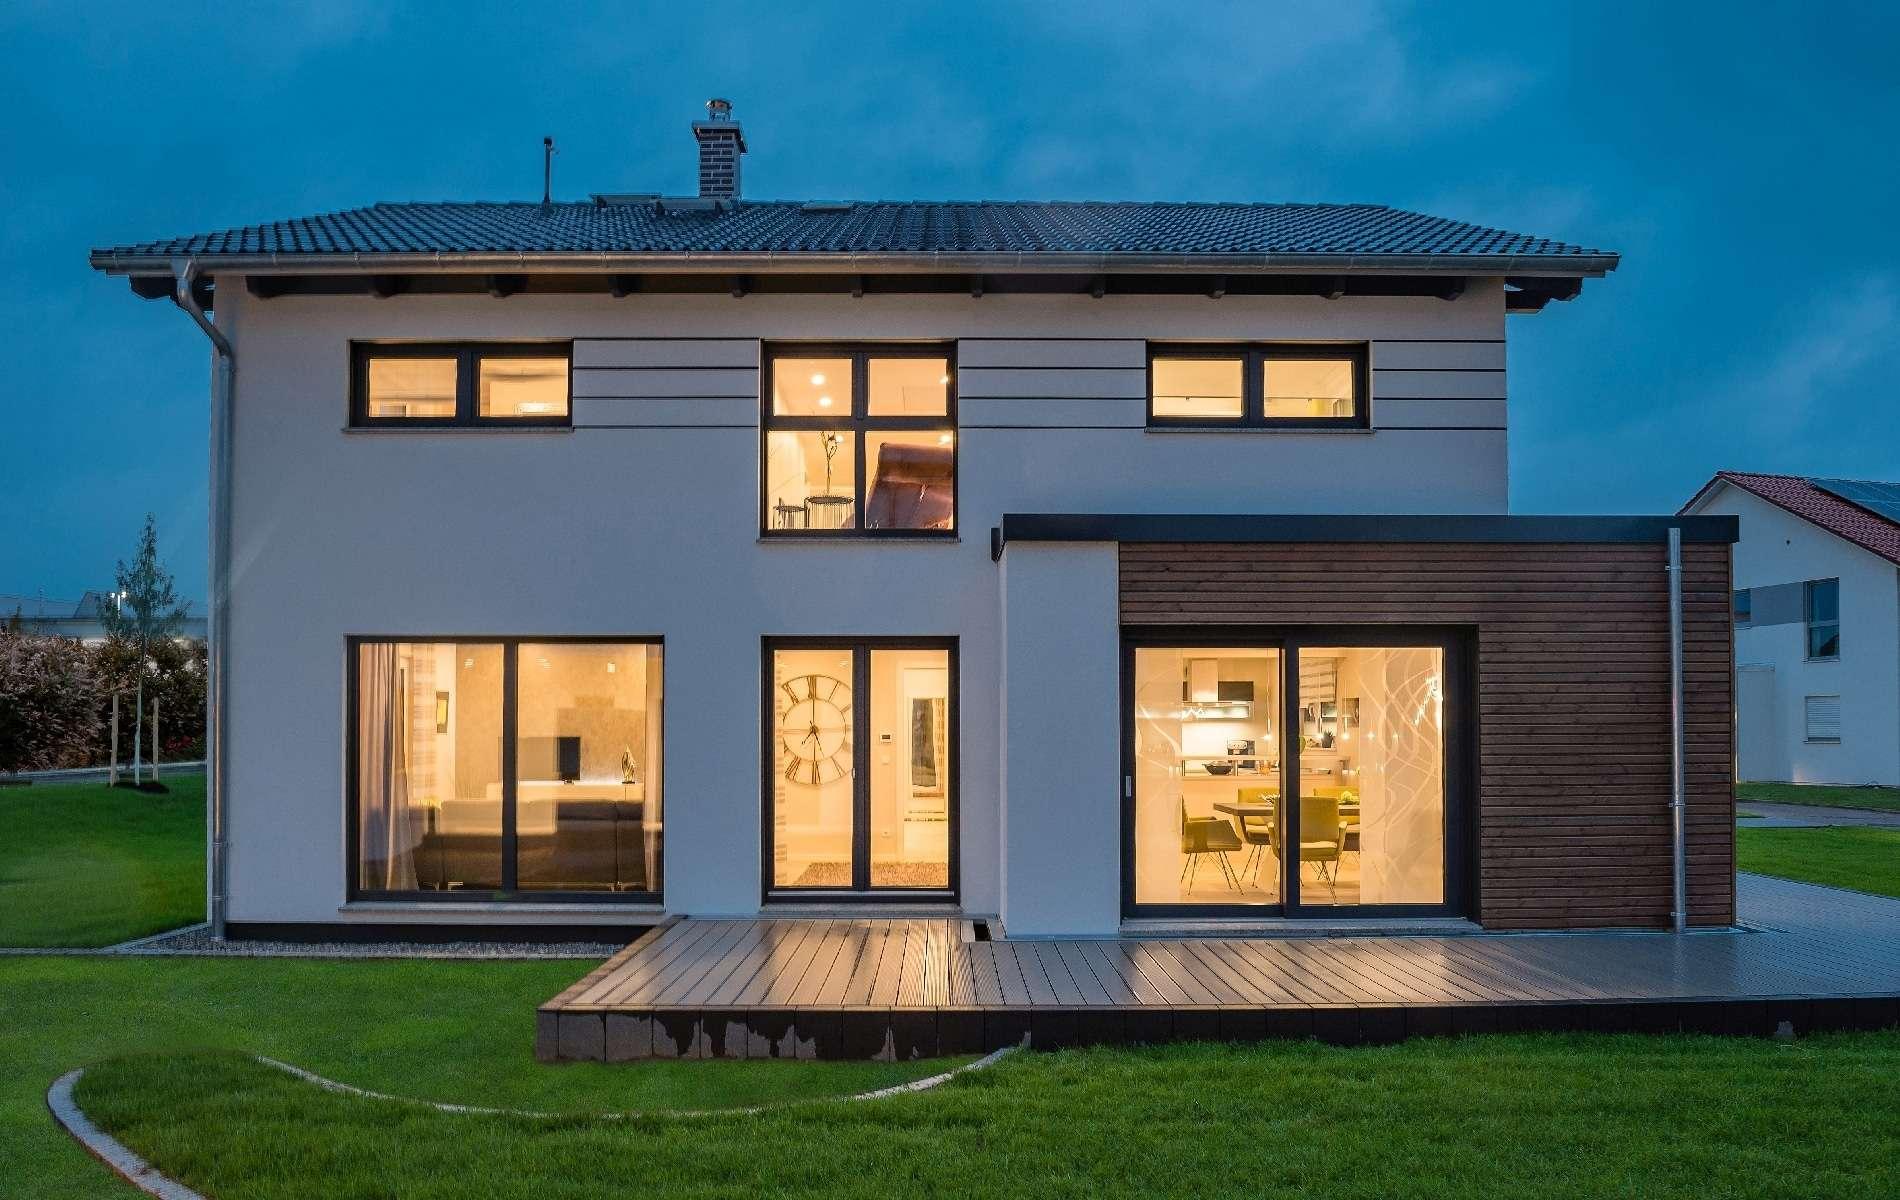 rensch haus musterhaus modena. Black Bedroom Furniture Sets. Home Design Ideas